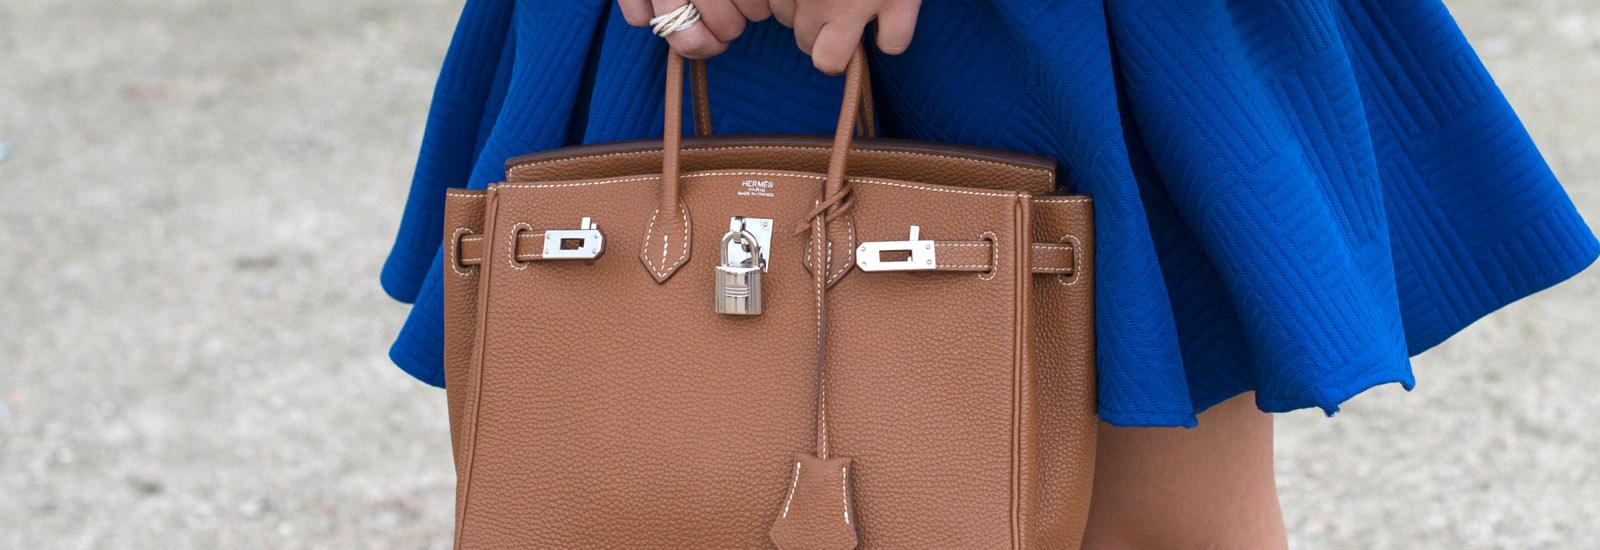 Cost for an Hermès Birkin Bag - Howmuchdoesitcost.com 84c14e776560